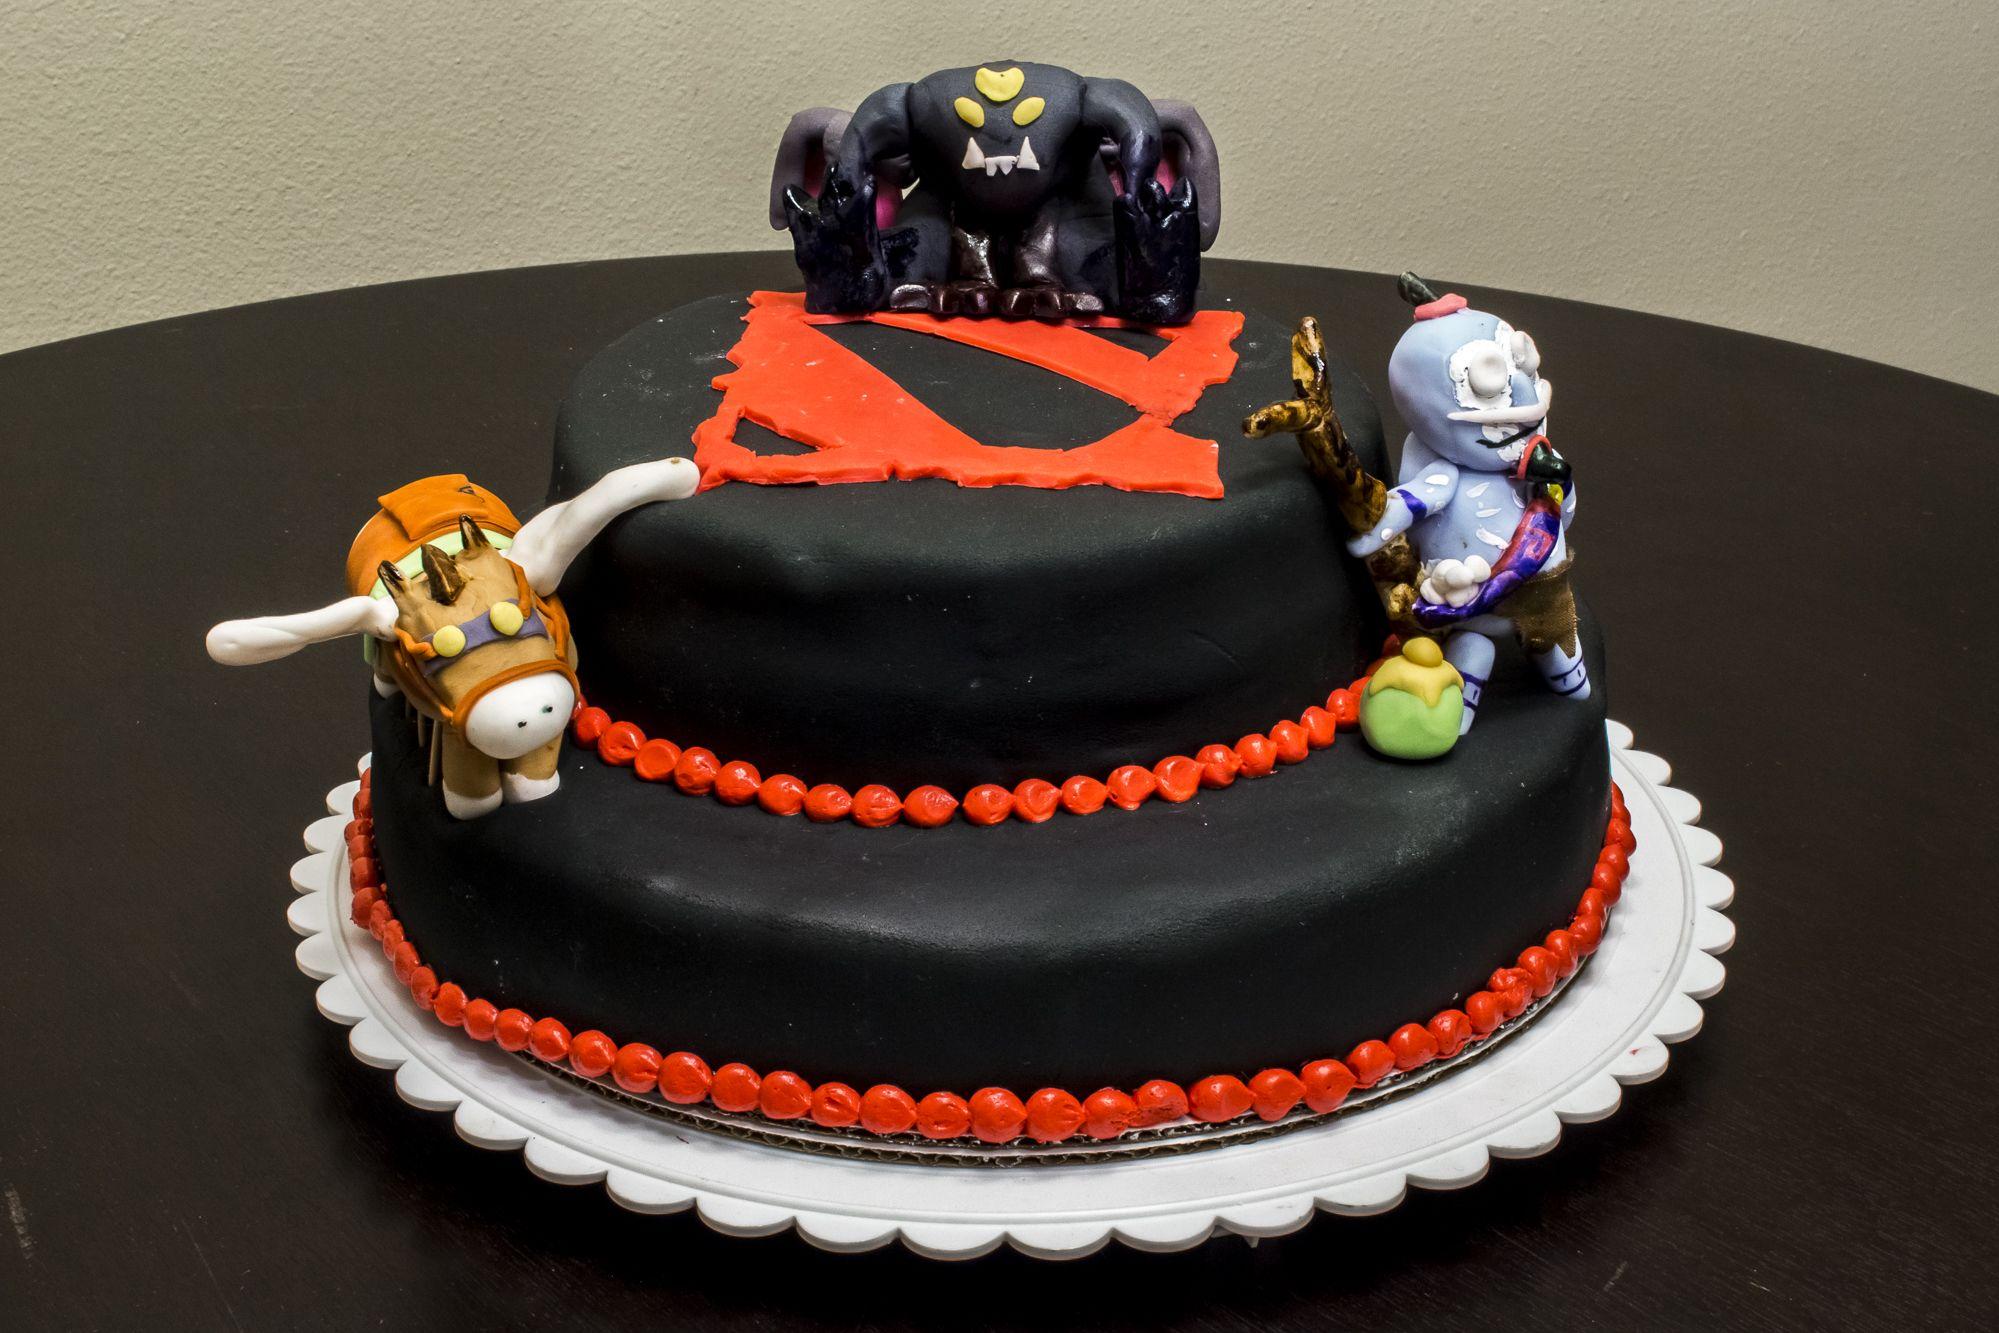 Dota 2 Cake Courrier Food Cake Designs Pinterest Cake Dota 2